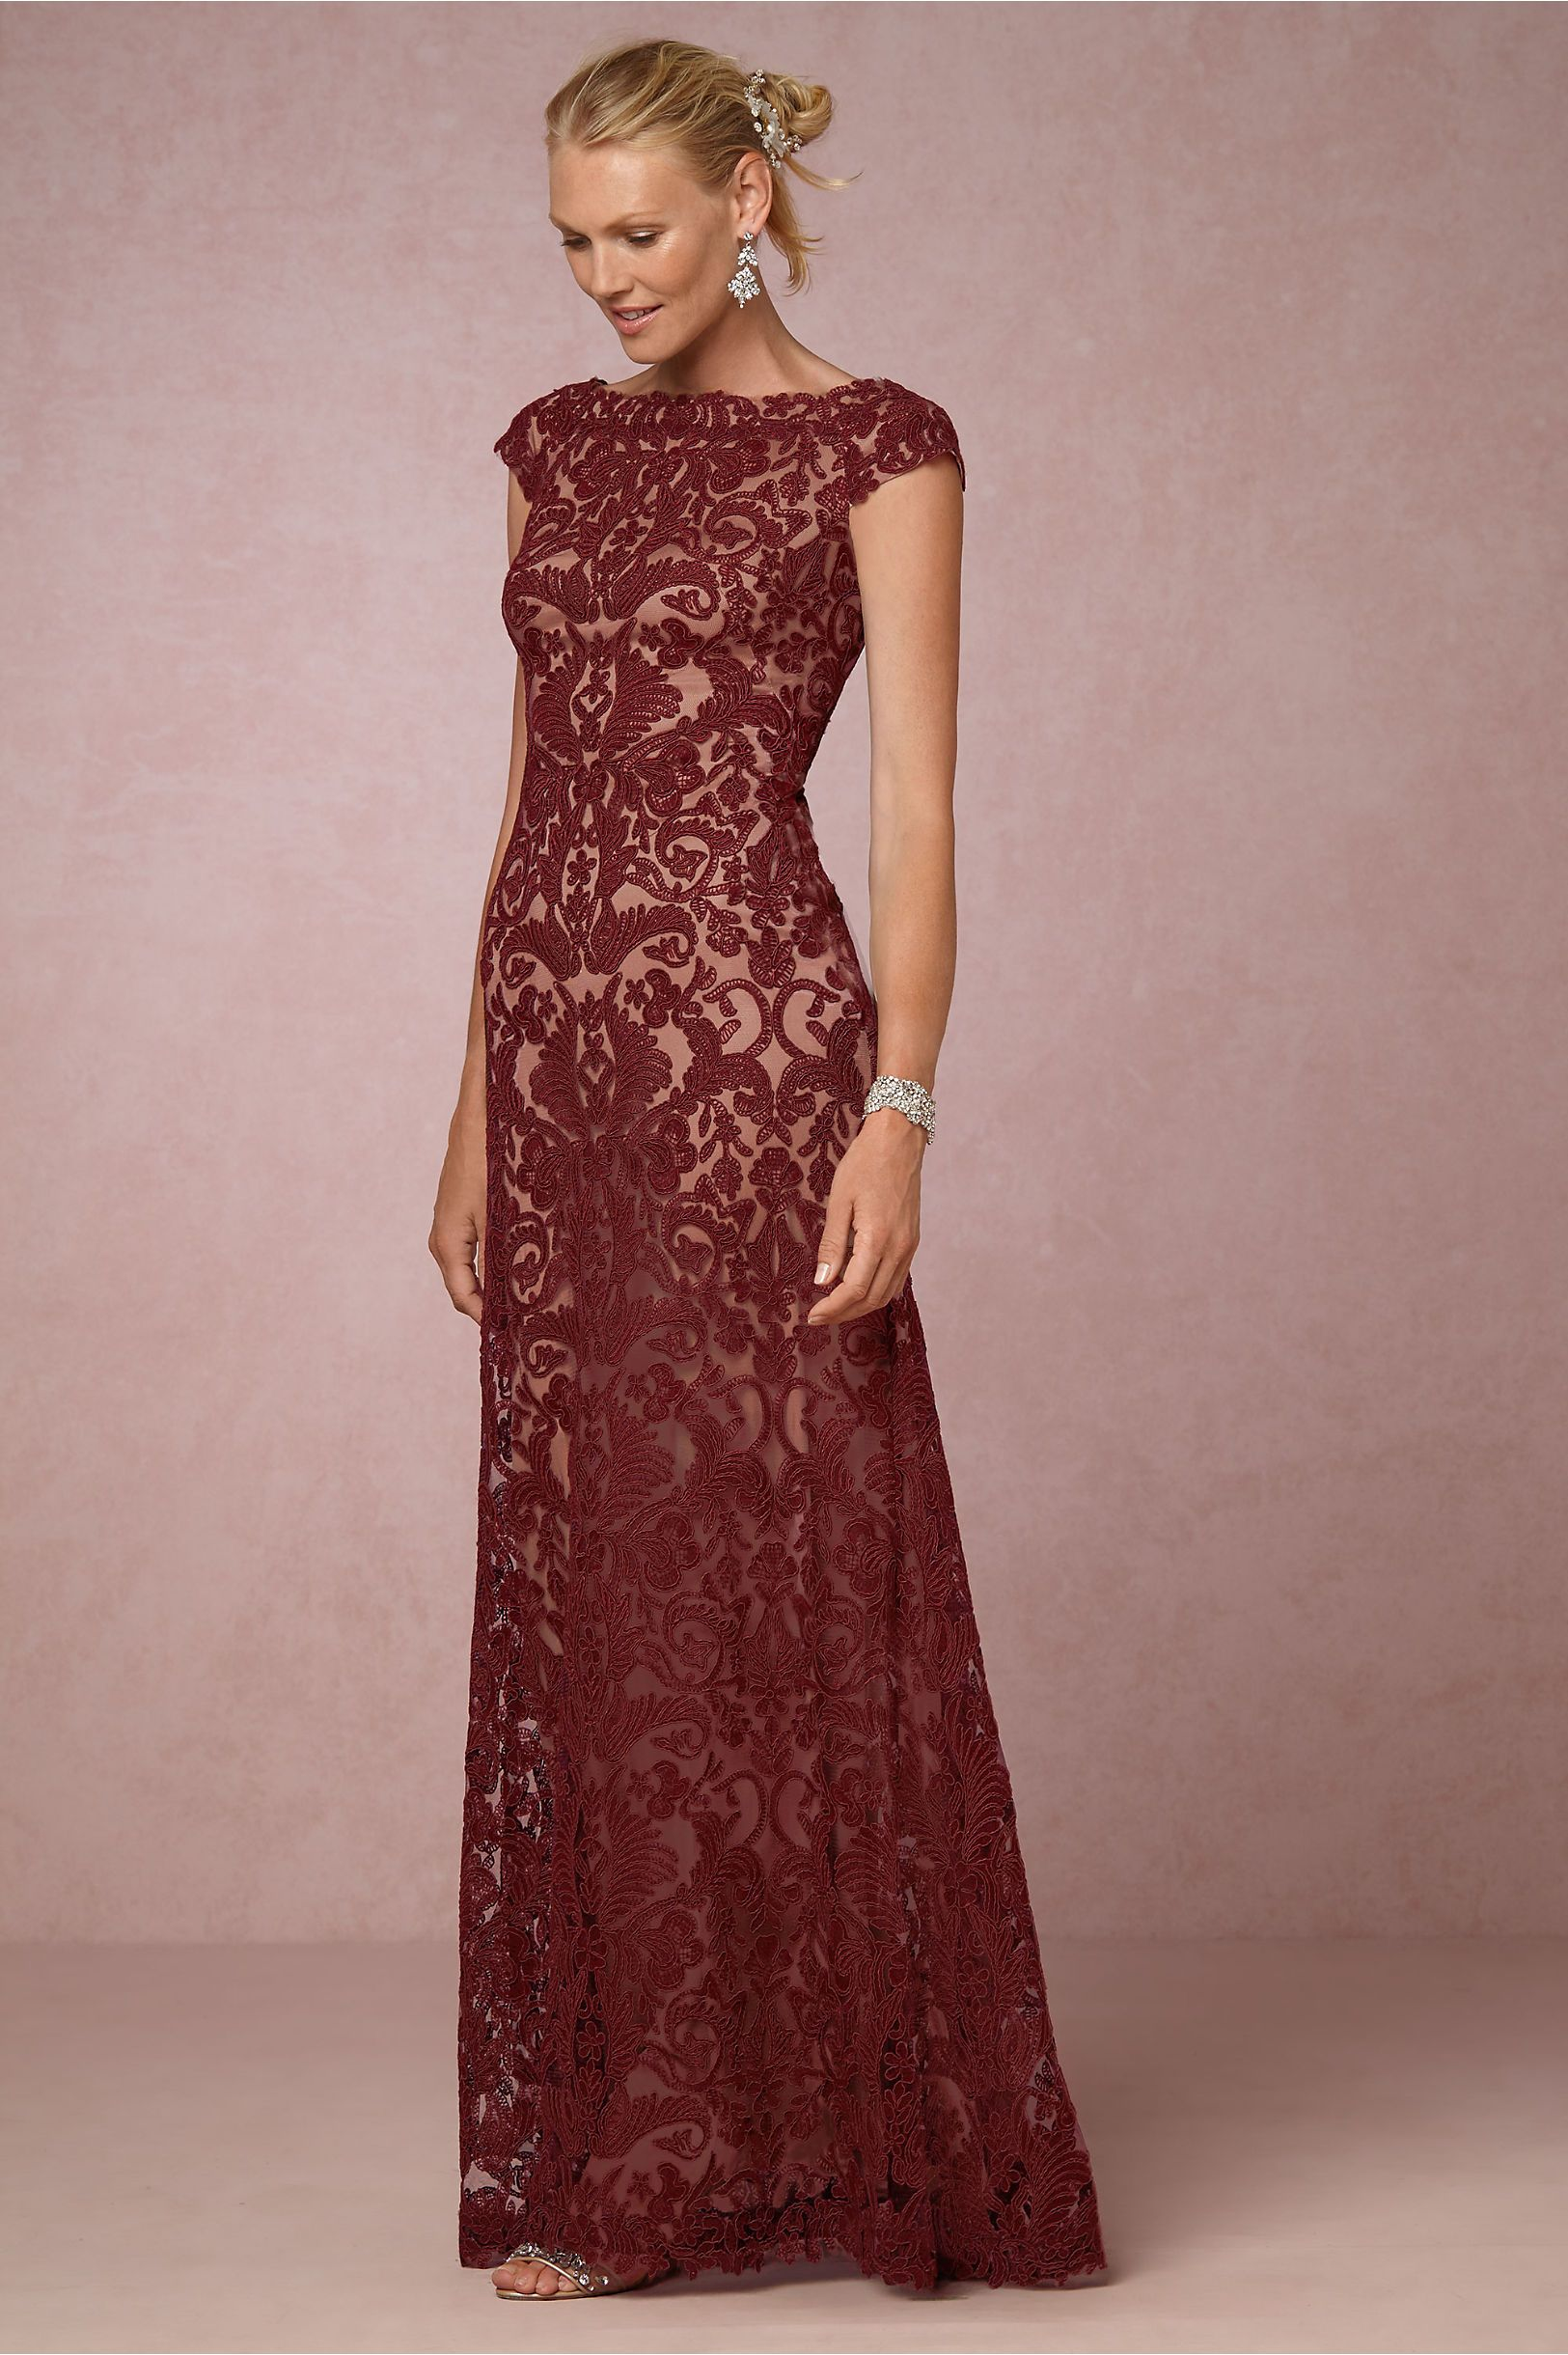 8de2c8ac31e Georgie Dress in Dresses Mother of the Bride Dresses at BHLDN ...